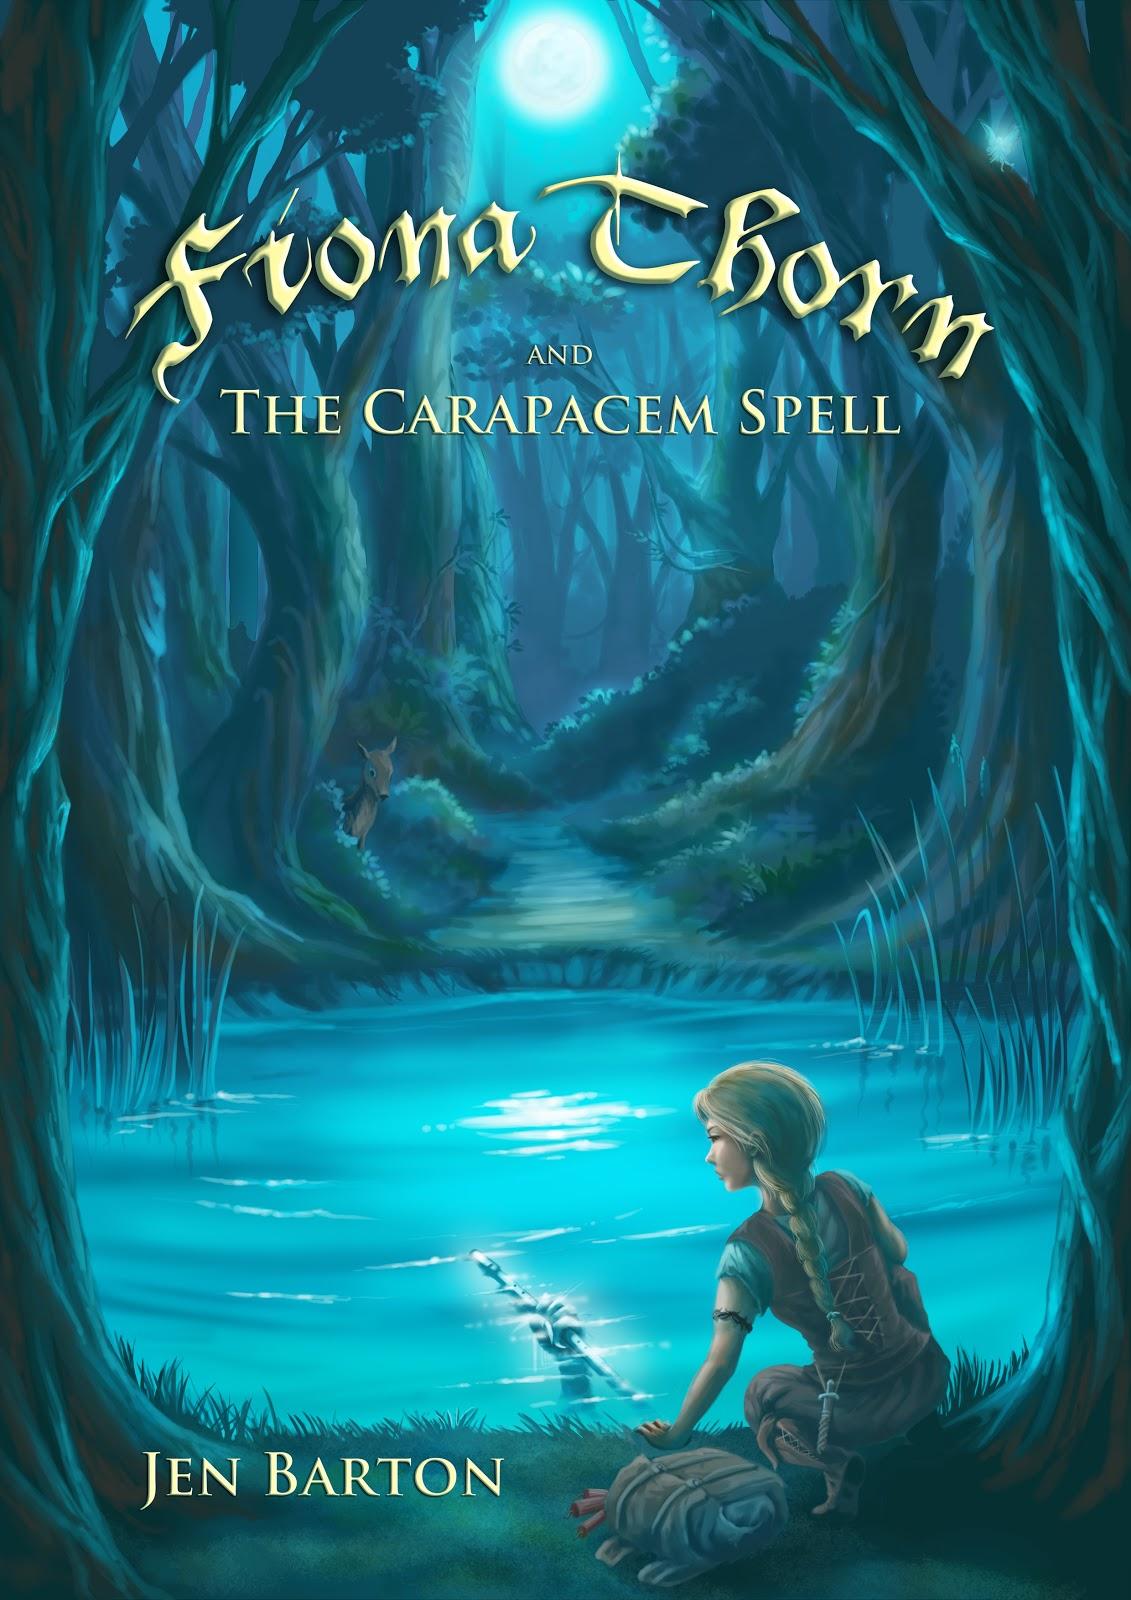 http://1.bp.blogspot.com/-GNd2iztDGdQ/UL3_ZBCoyAI/AAAAAAAABFk/_FkO-QCKwJ4/s1600/Fiona_Thorn.jpeg